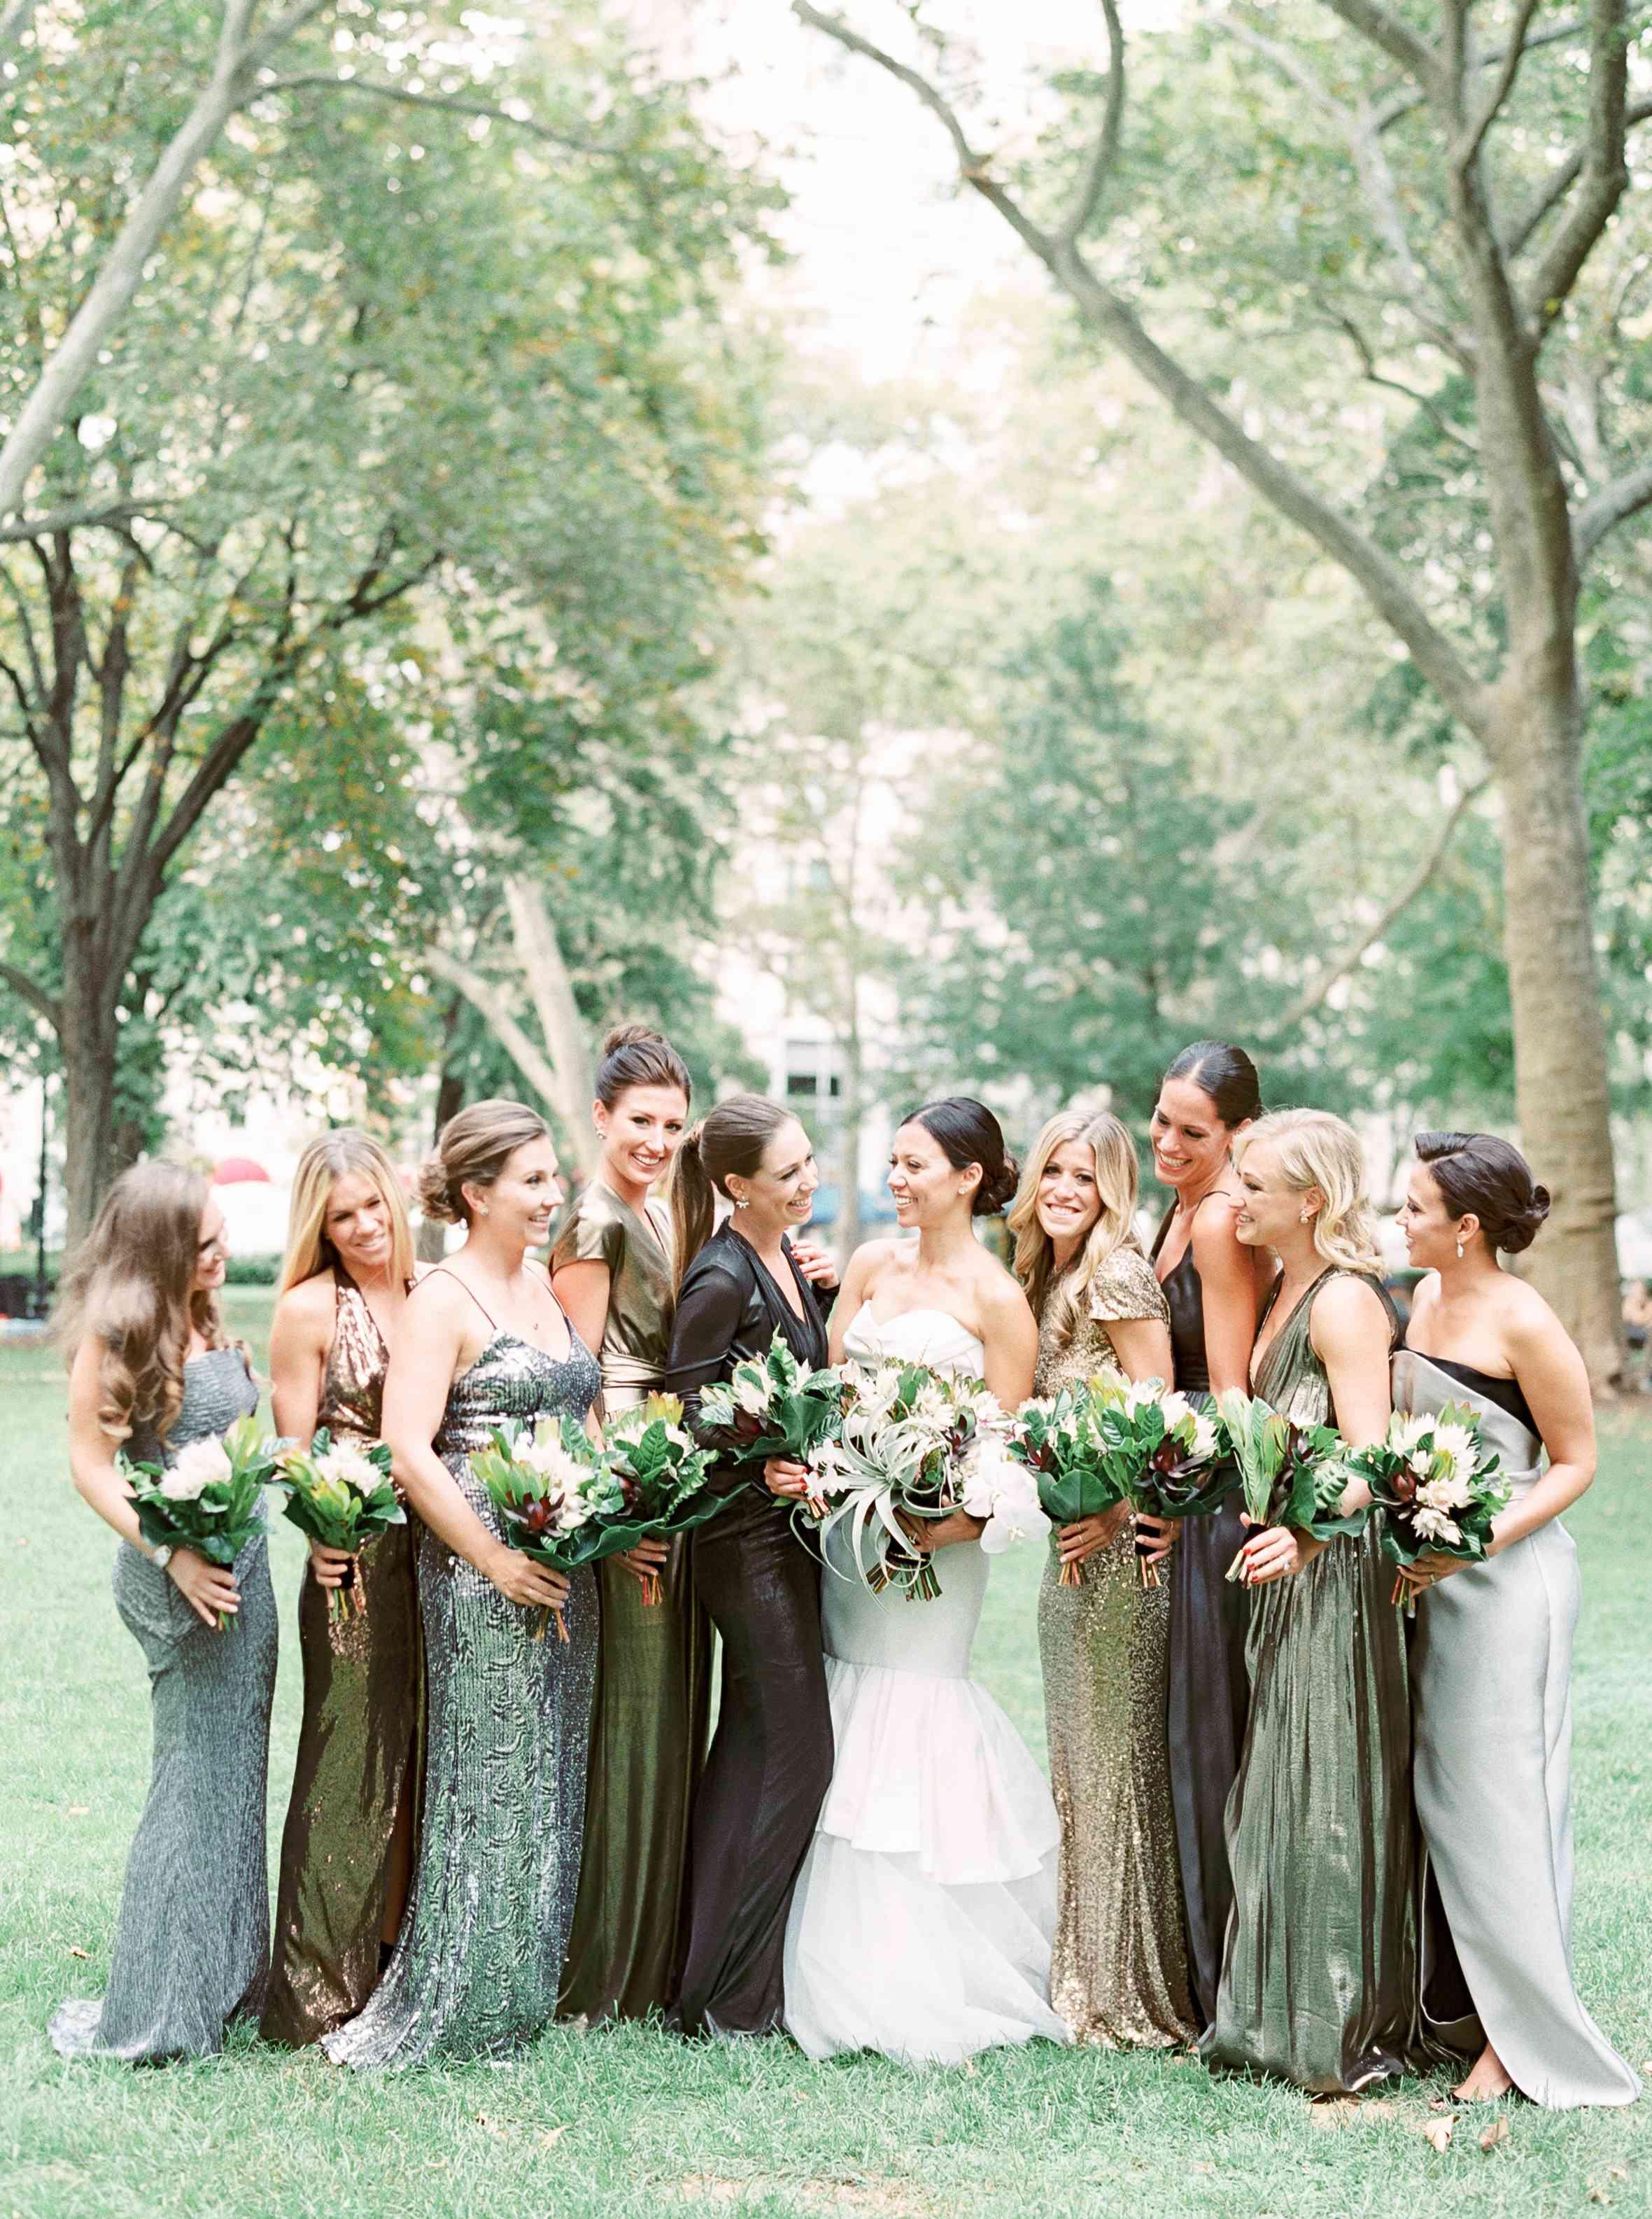 Bride with Bridesmaids in Mismatched Metallic Bridesmaid Dresses